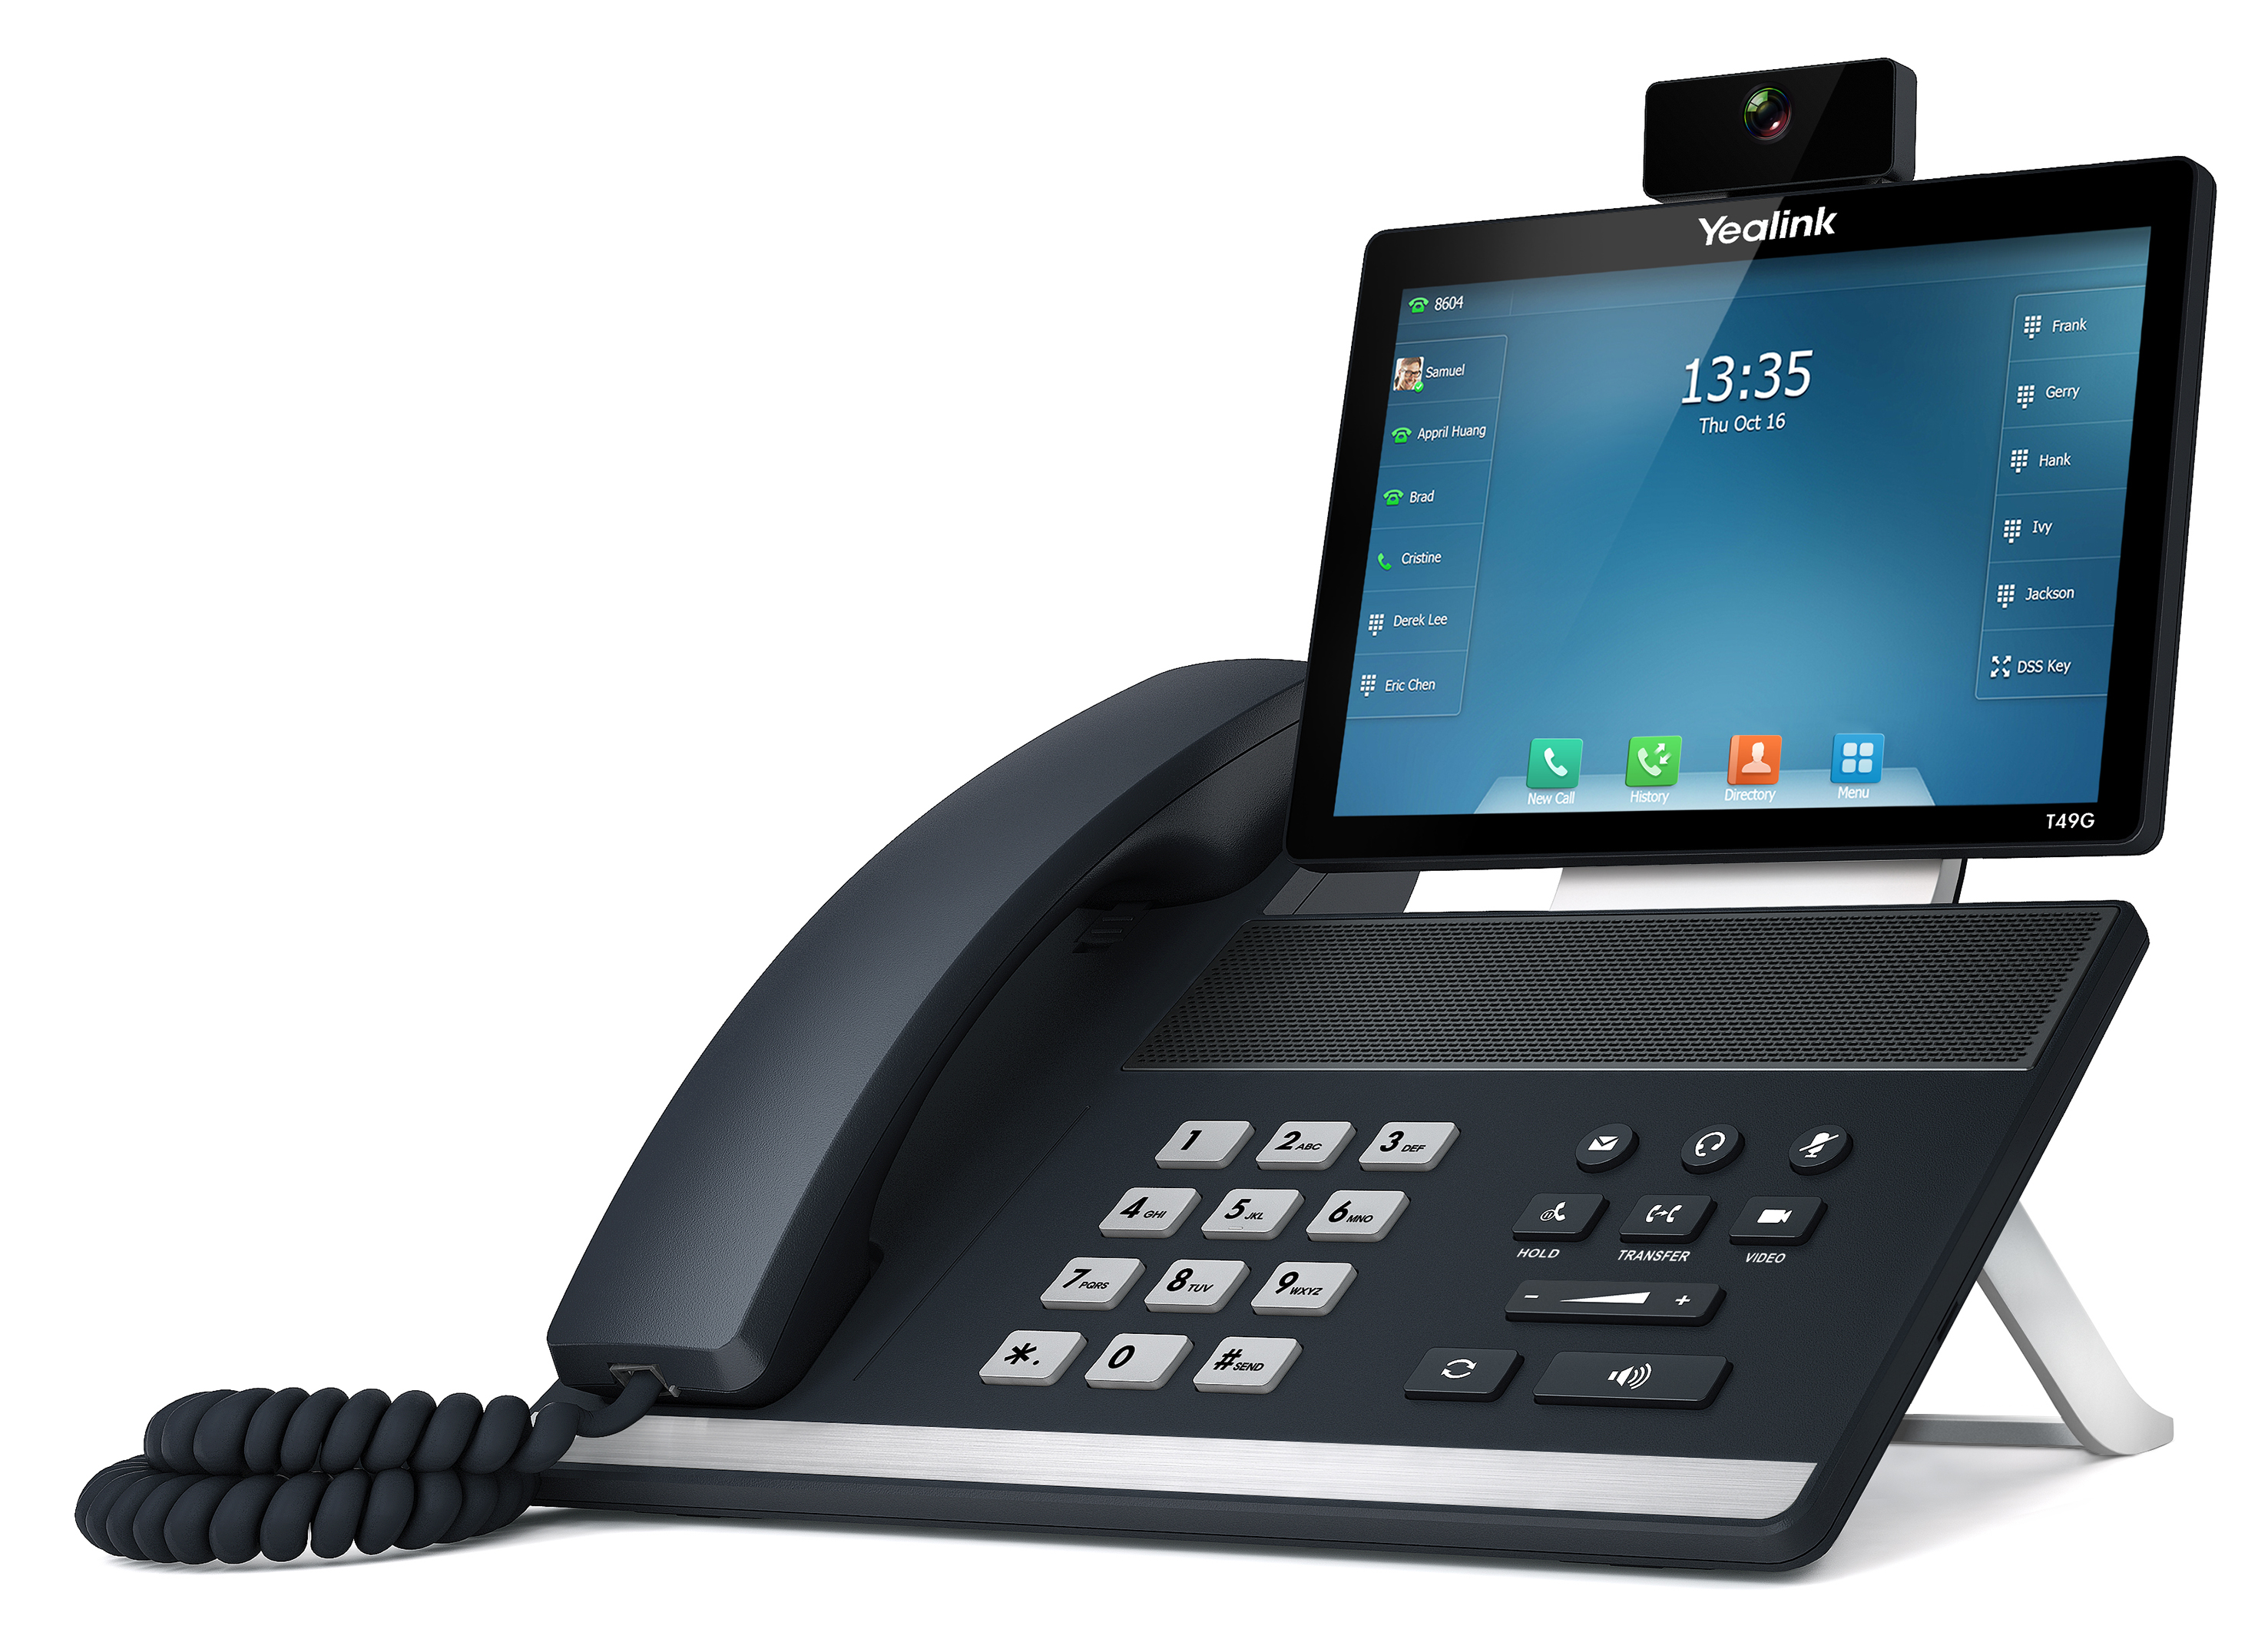 T49 yealink טלפון יאלינק רשת חינם עסק